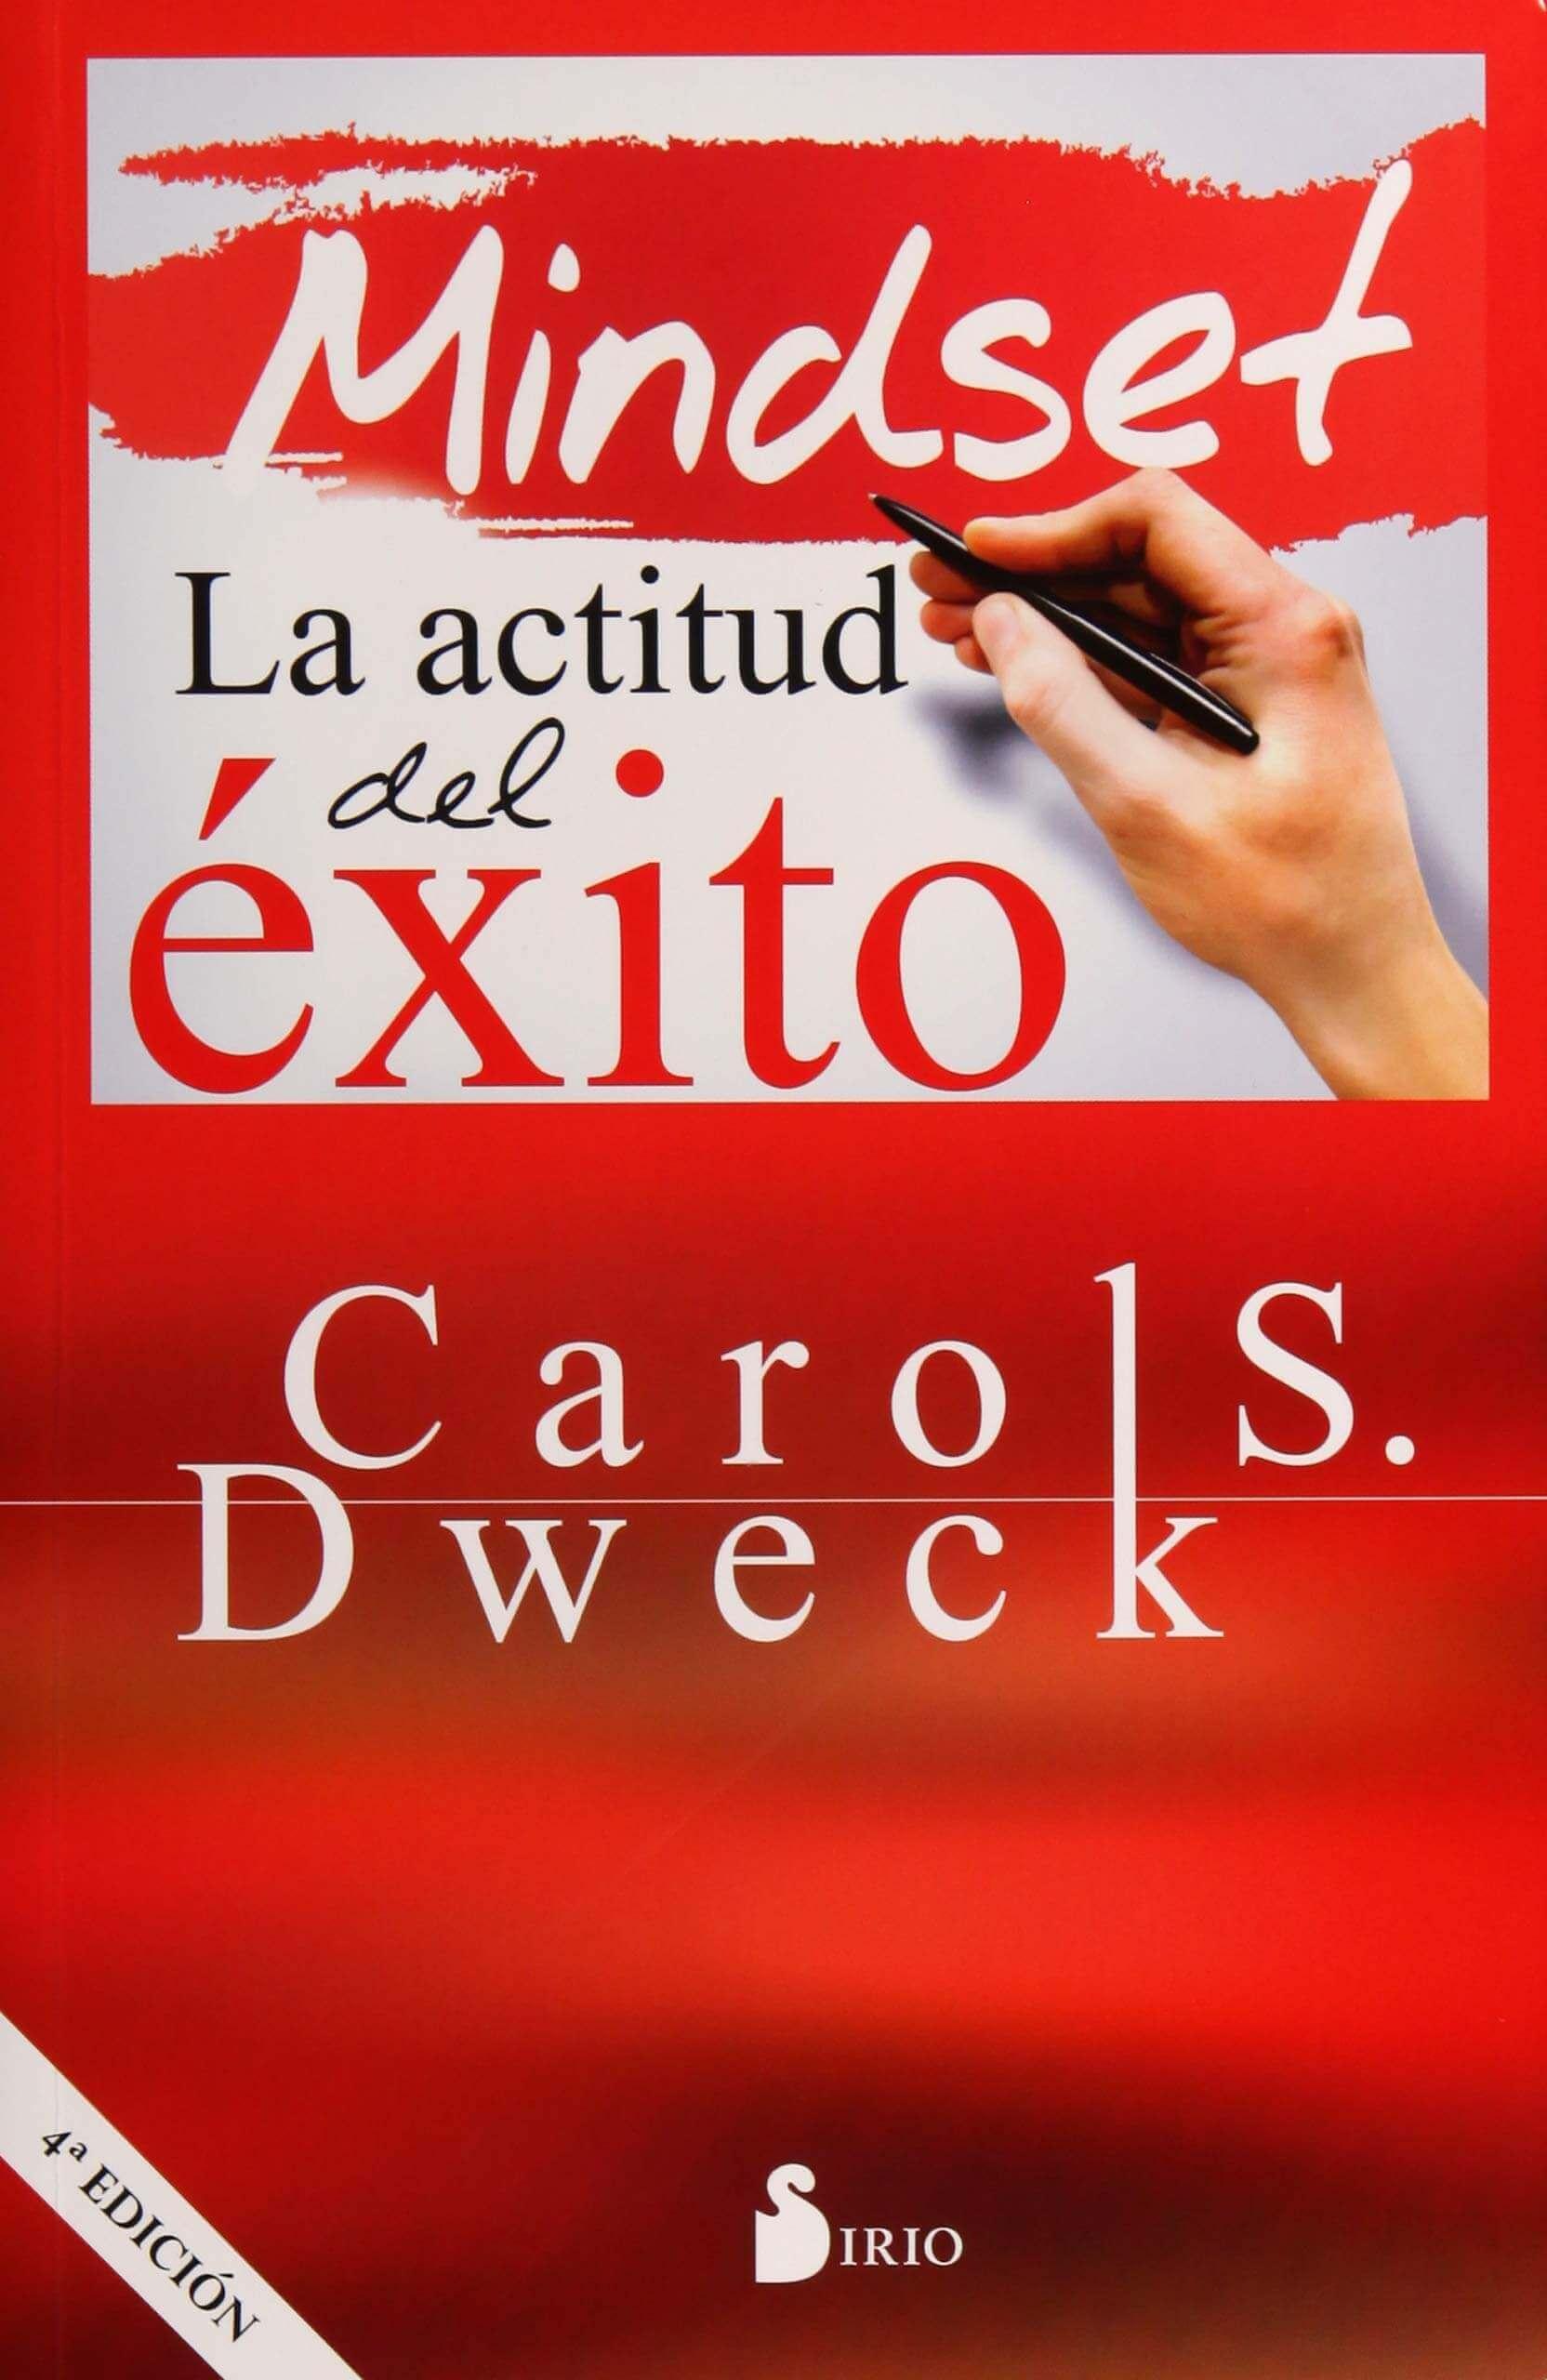 mindsett carol dweck - librosparaemprendedores.net (1)